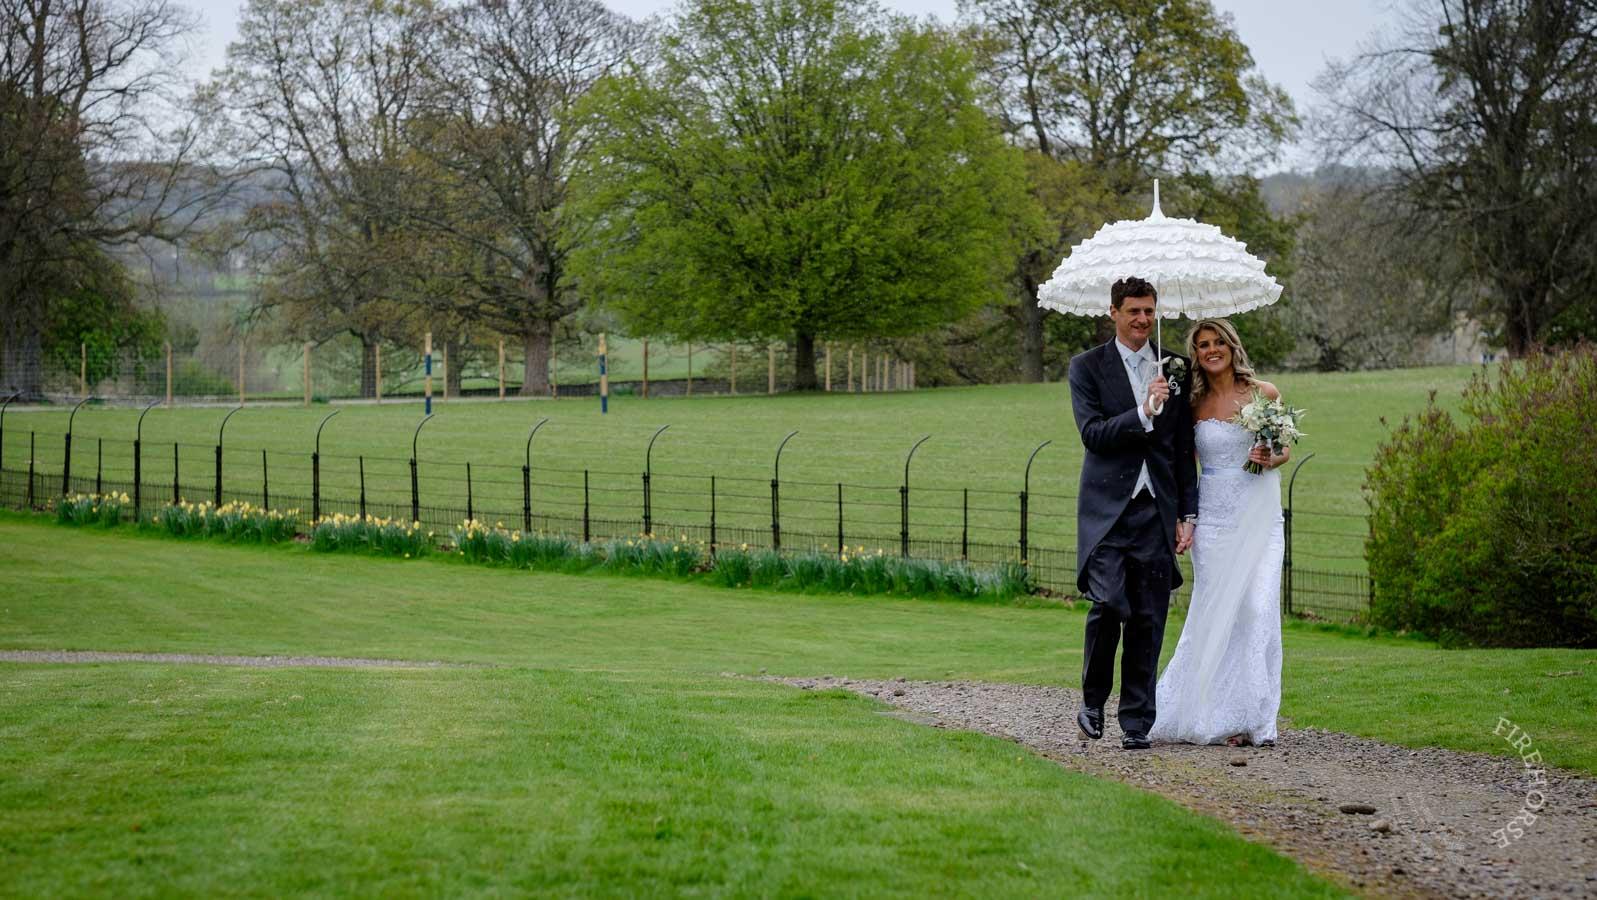 Swinton-Park-Spring-Wedding-237